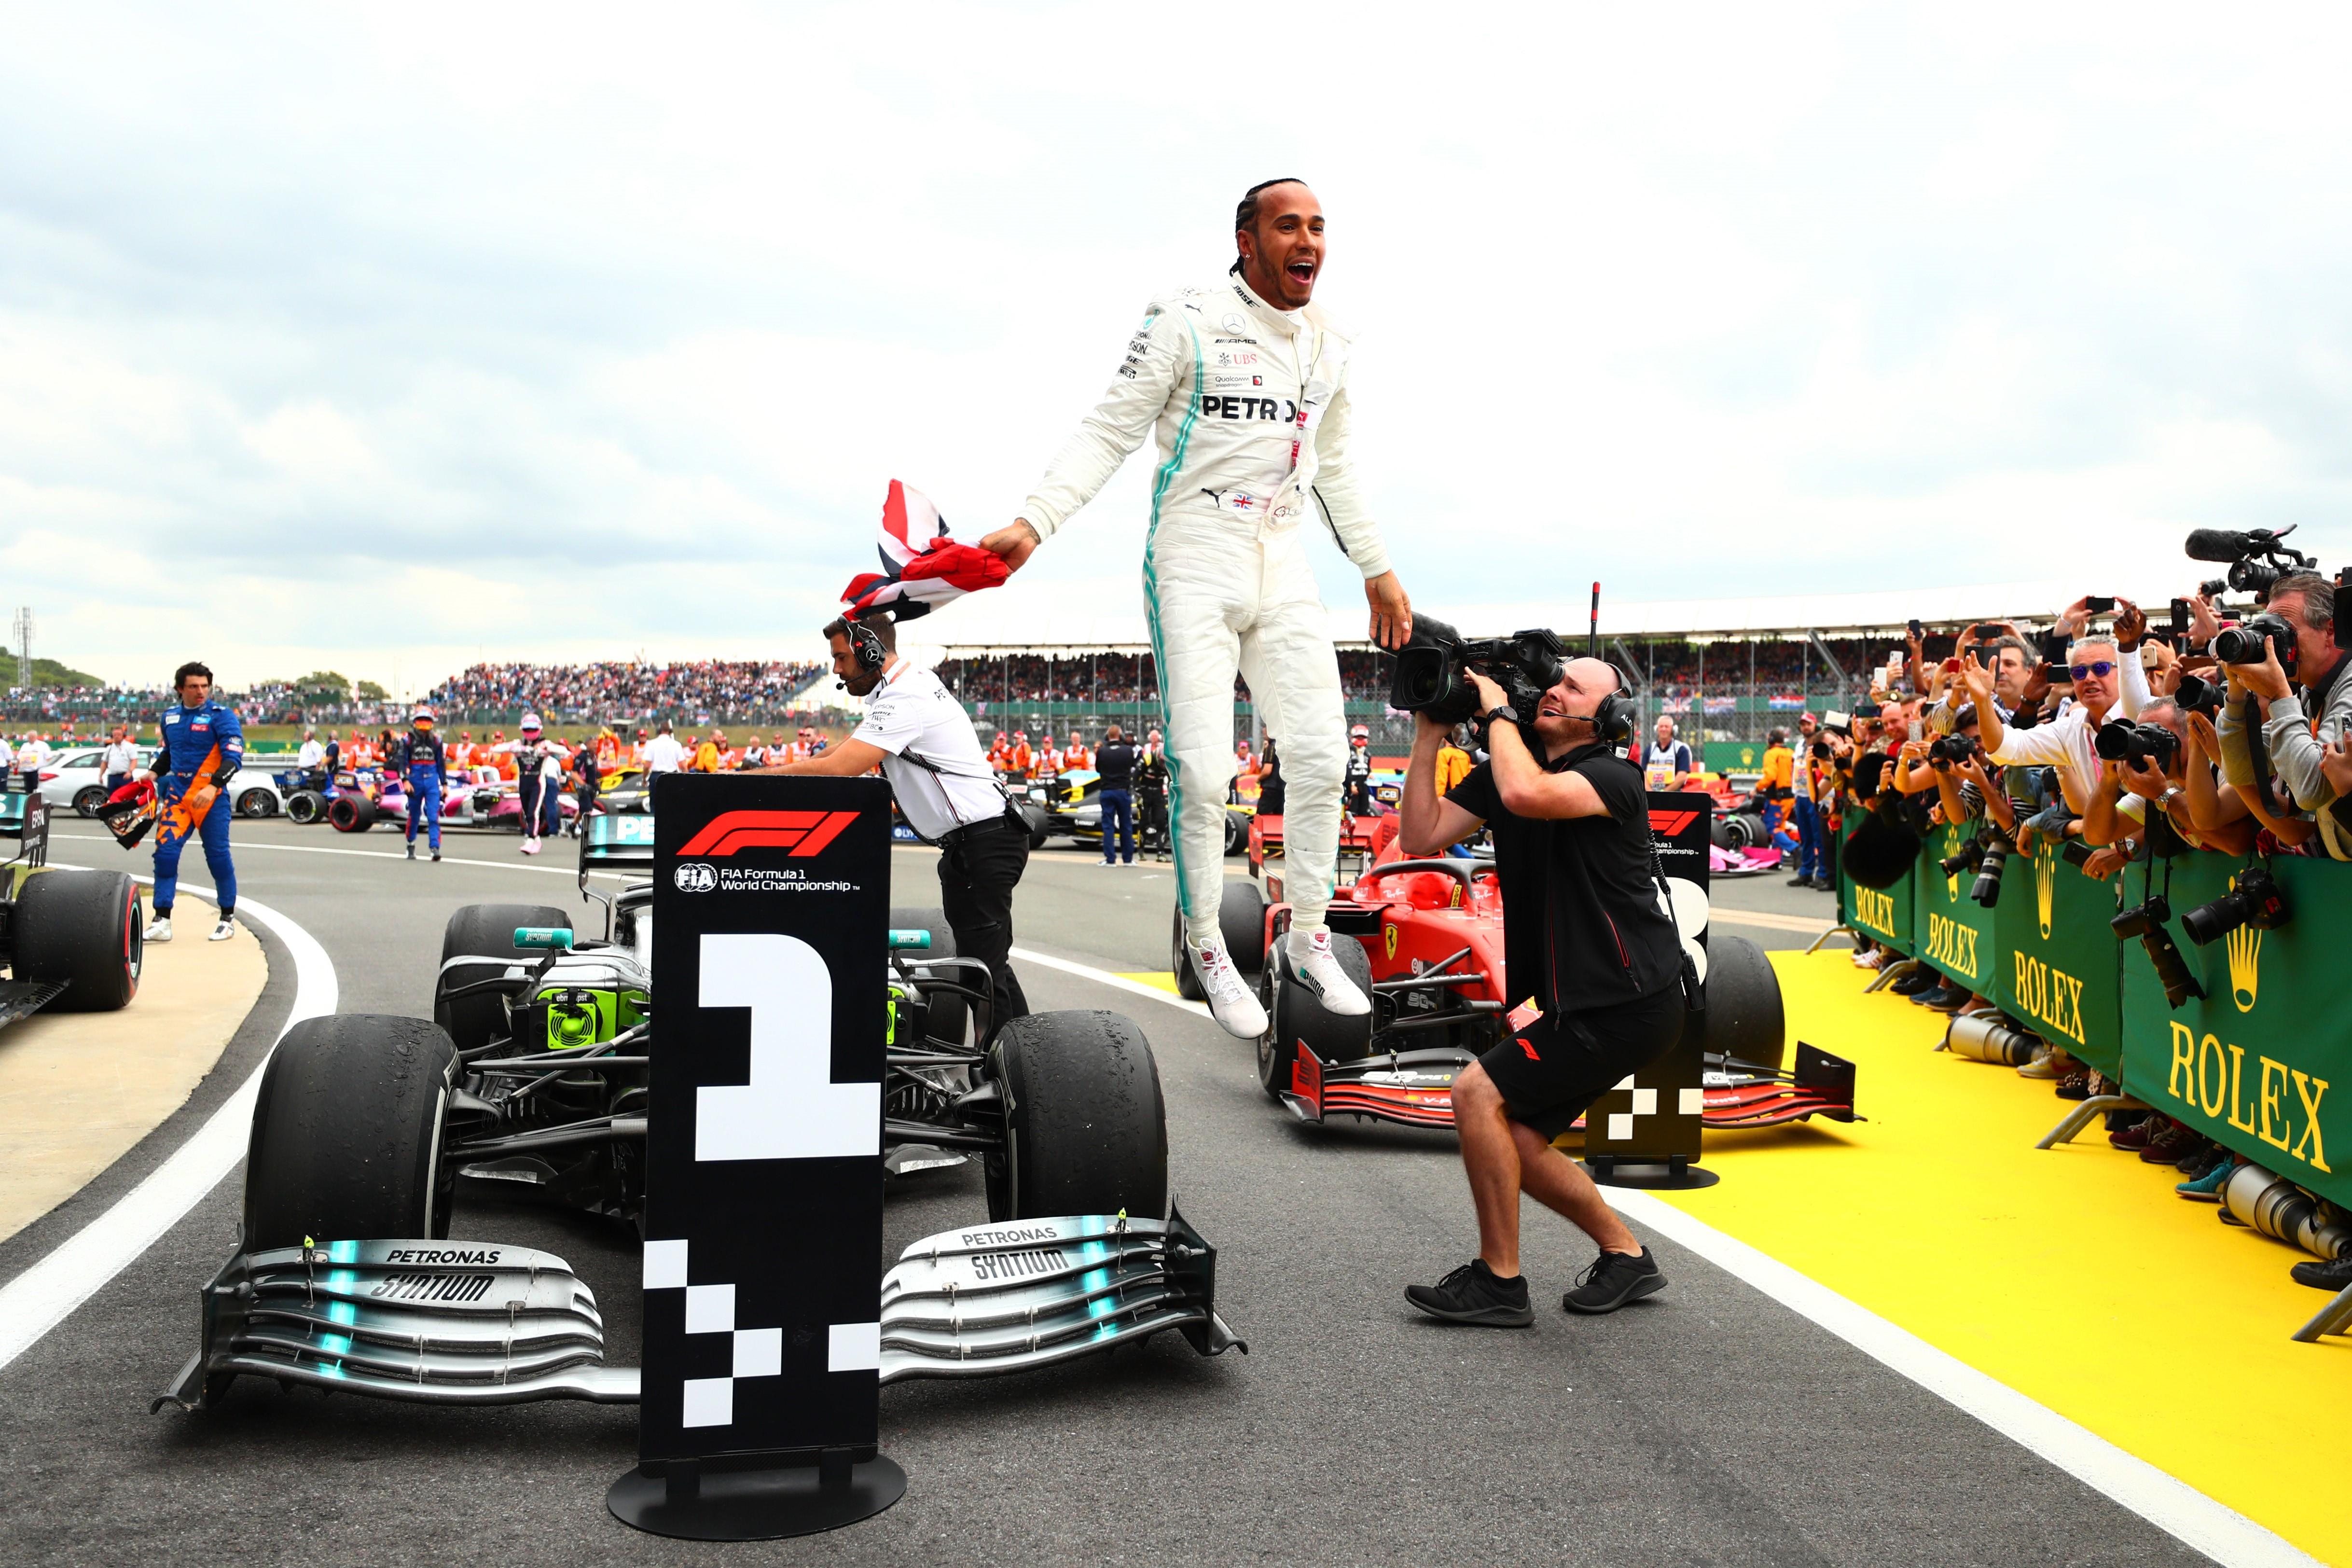 Lewis Hamilton (Mercedes) au Grand Prix de Grande Bretagne 2019